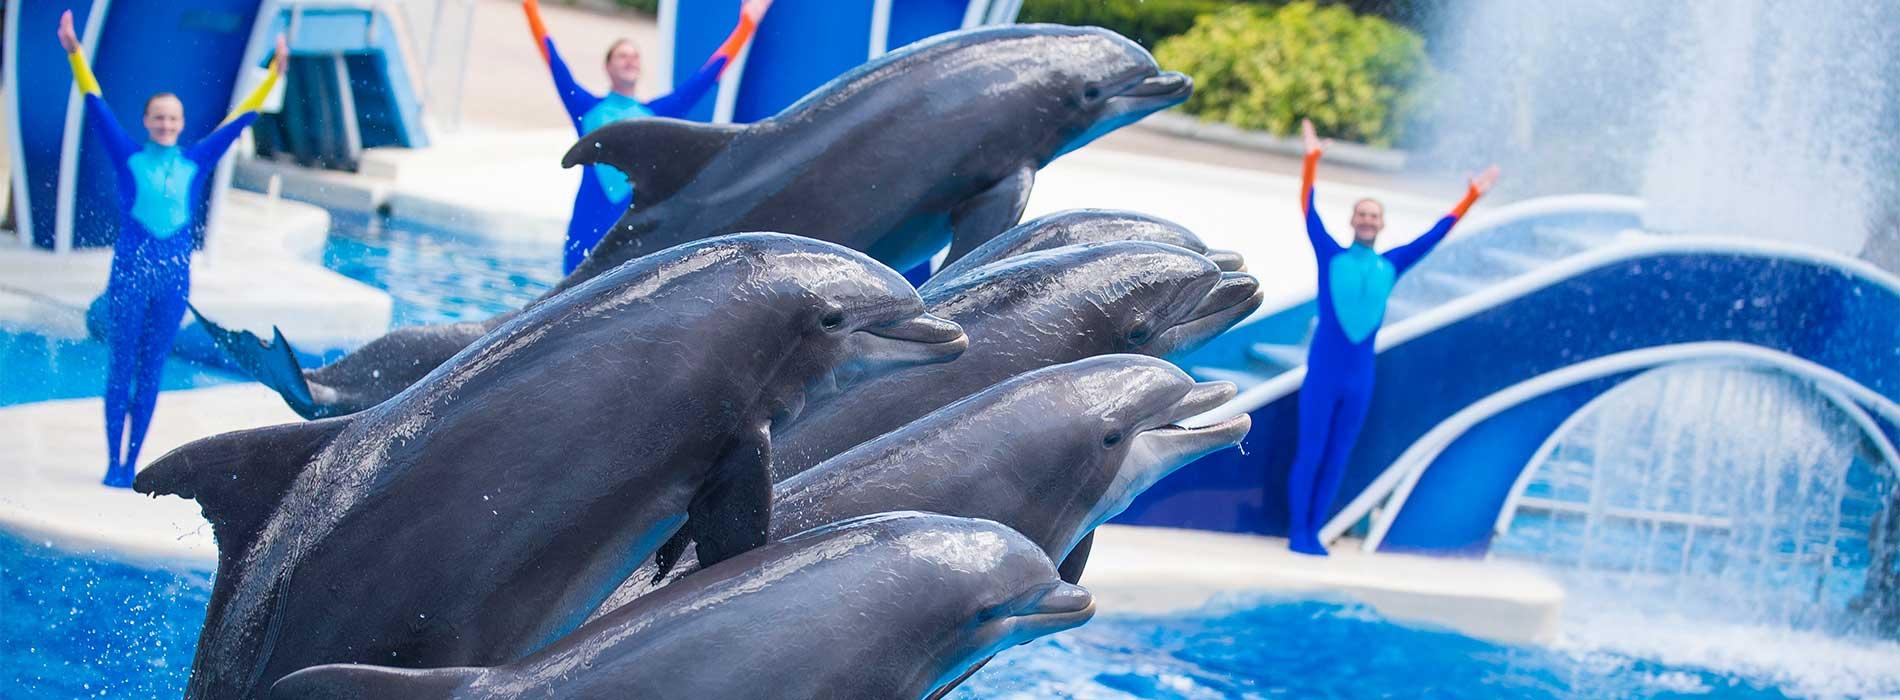 SeaWorld Orlando Dolphin Days Show